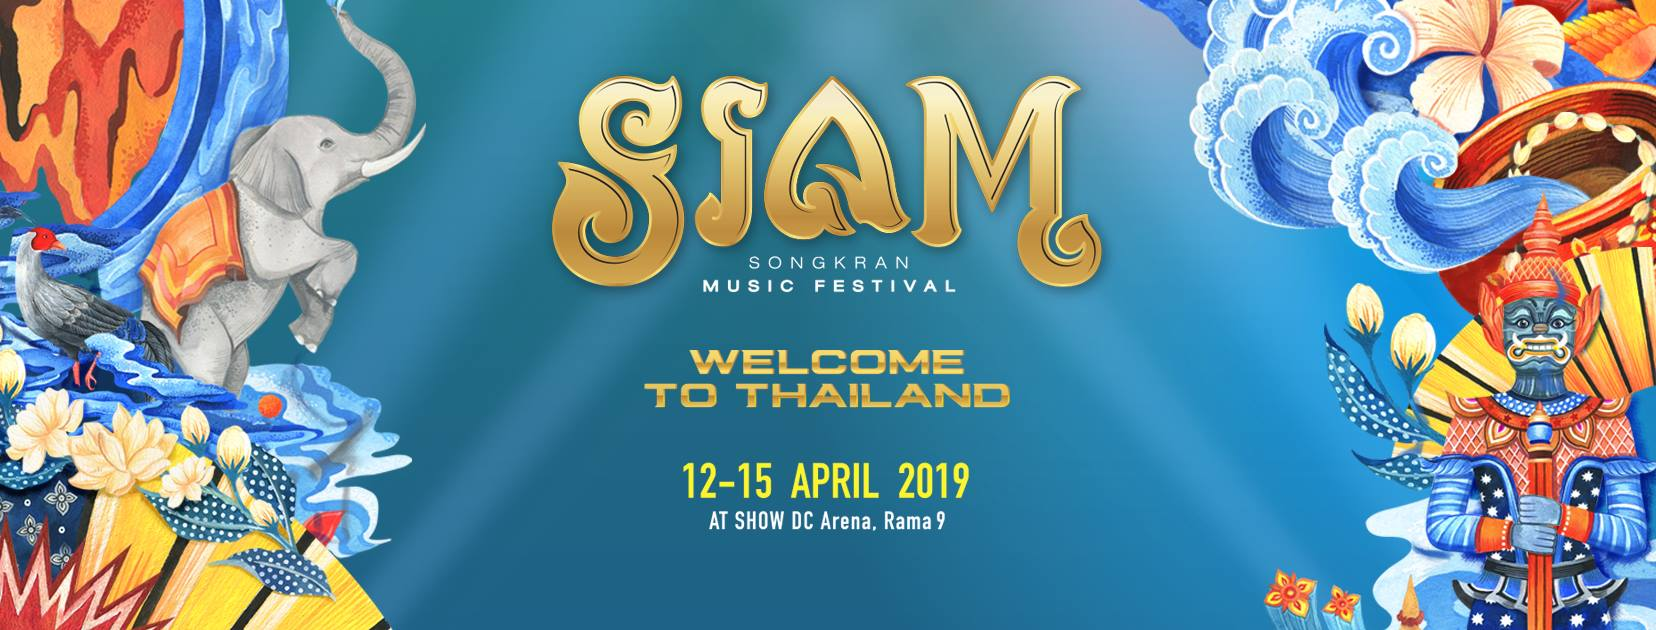 Siam SongKran Music Festival 2019